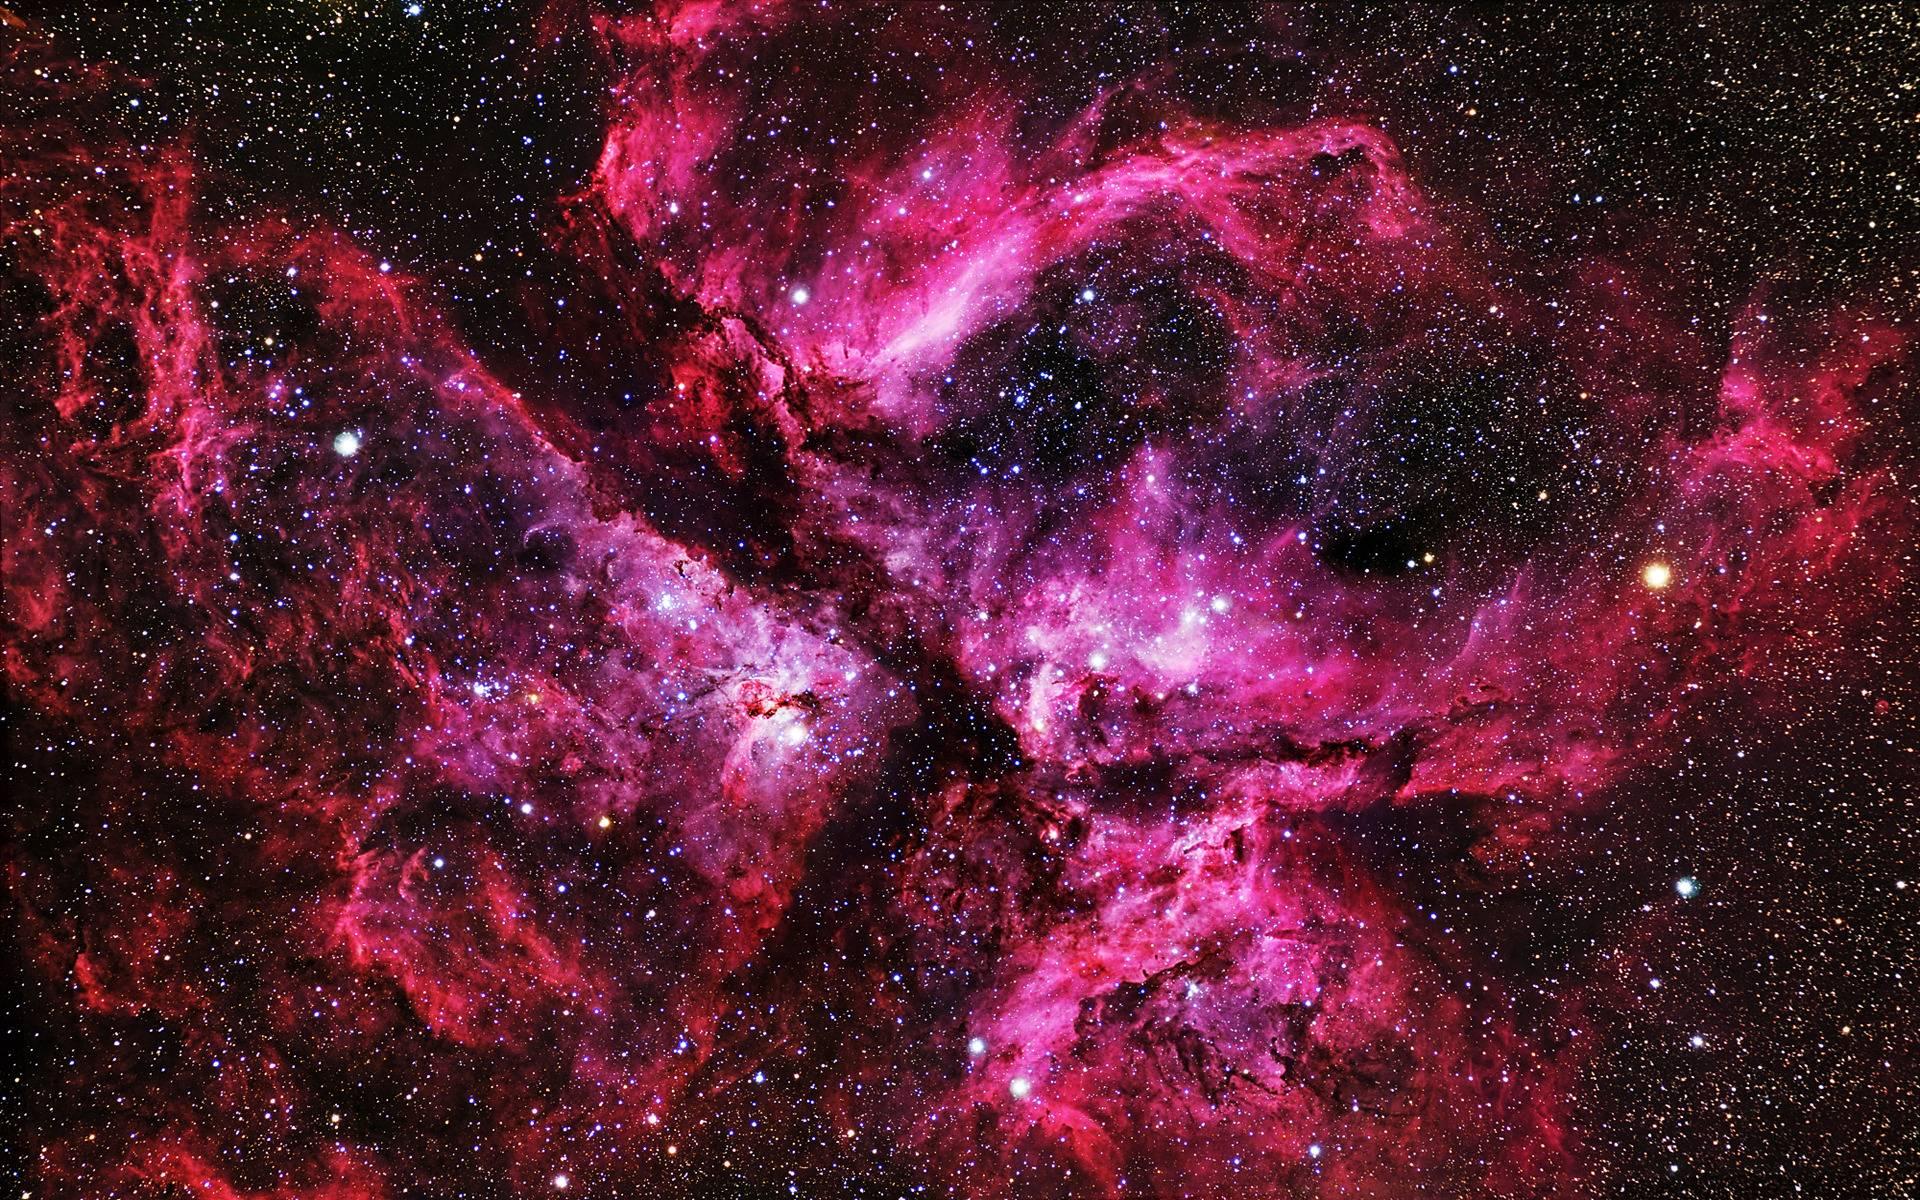 Galaxy Wallpaper Tumblr 002